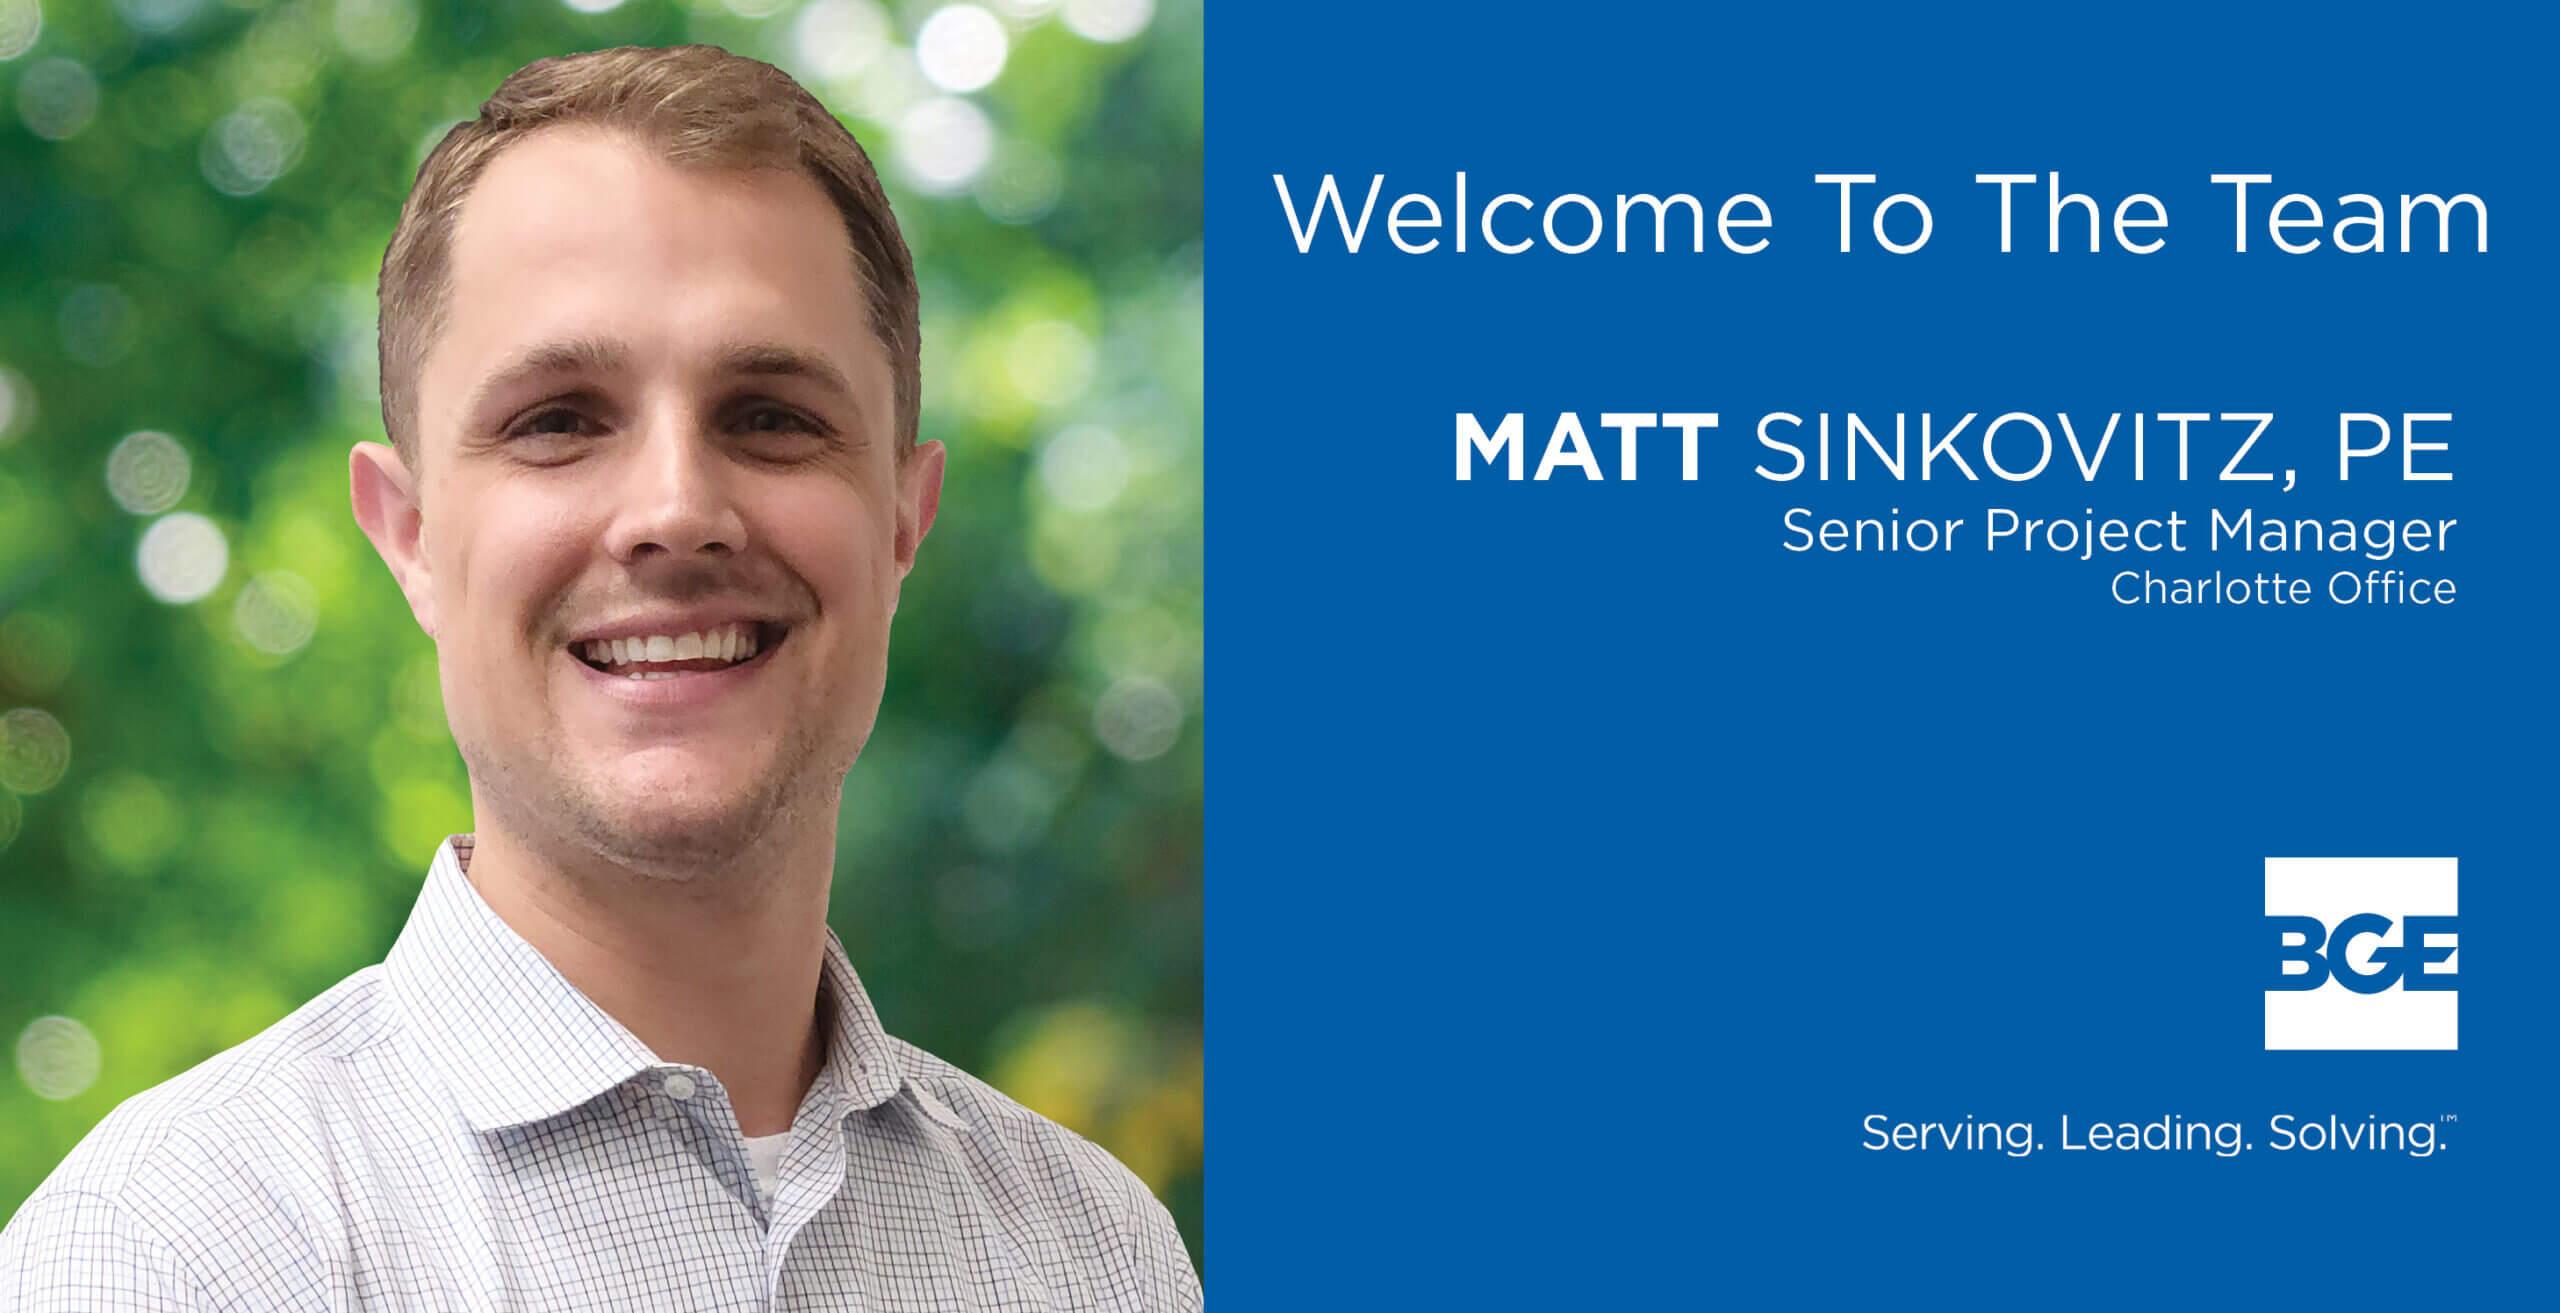 BGE Welcomes Matt Sinkovitz as Senior Project Manager